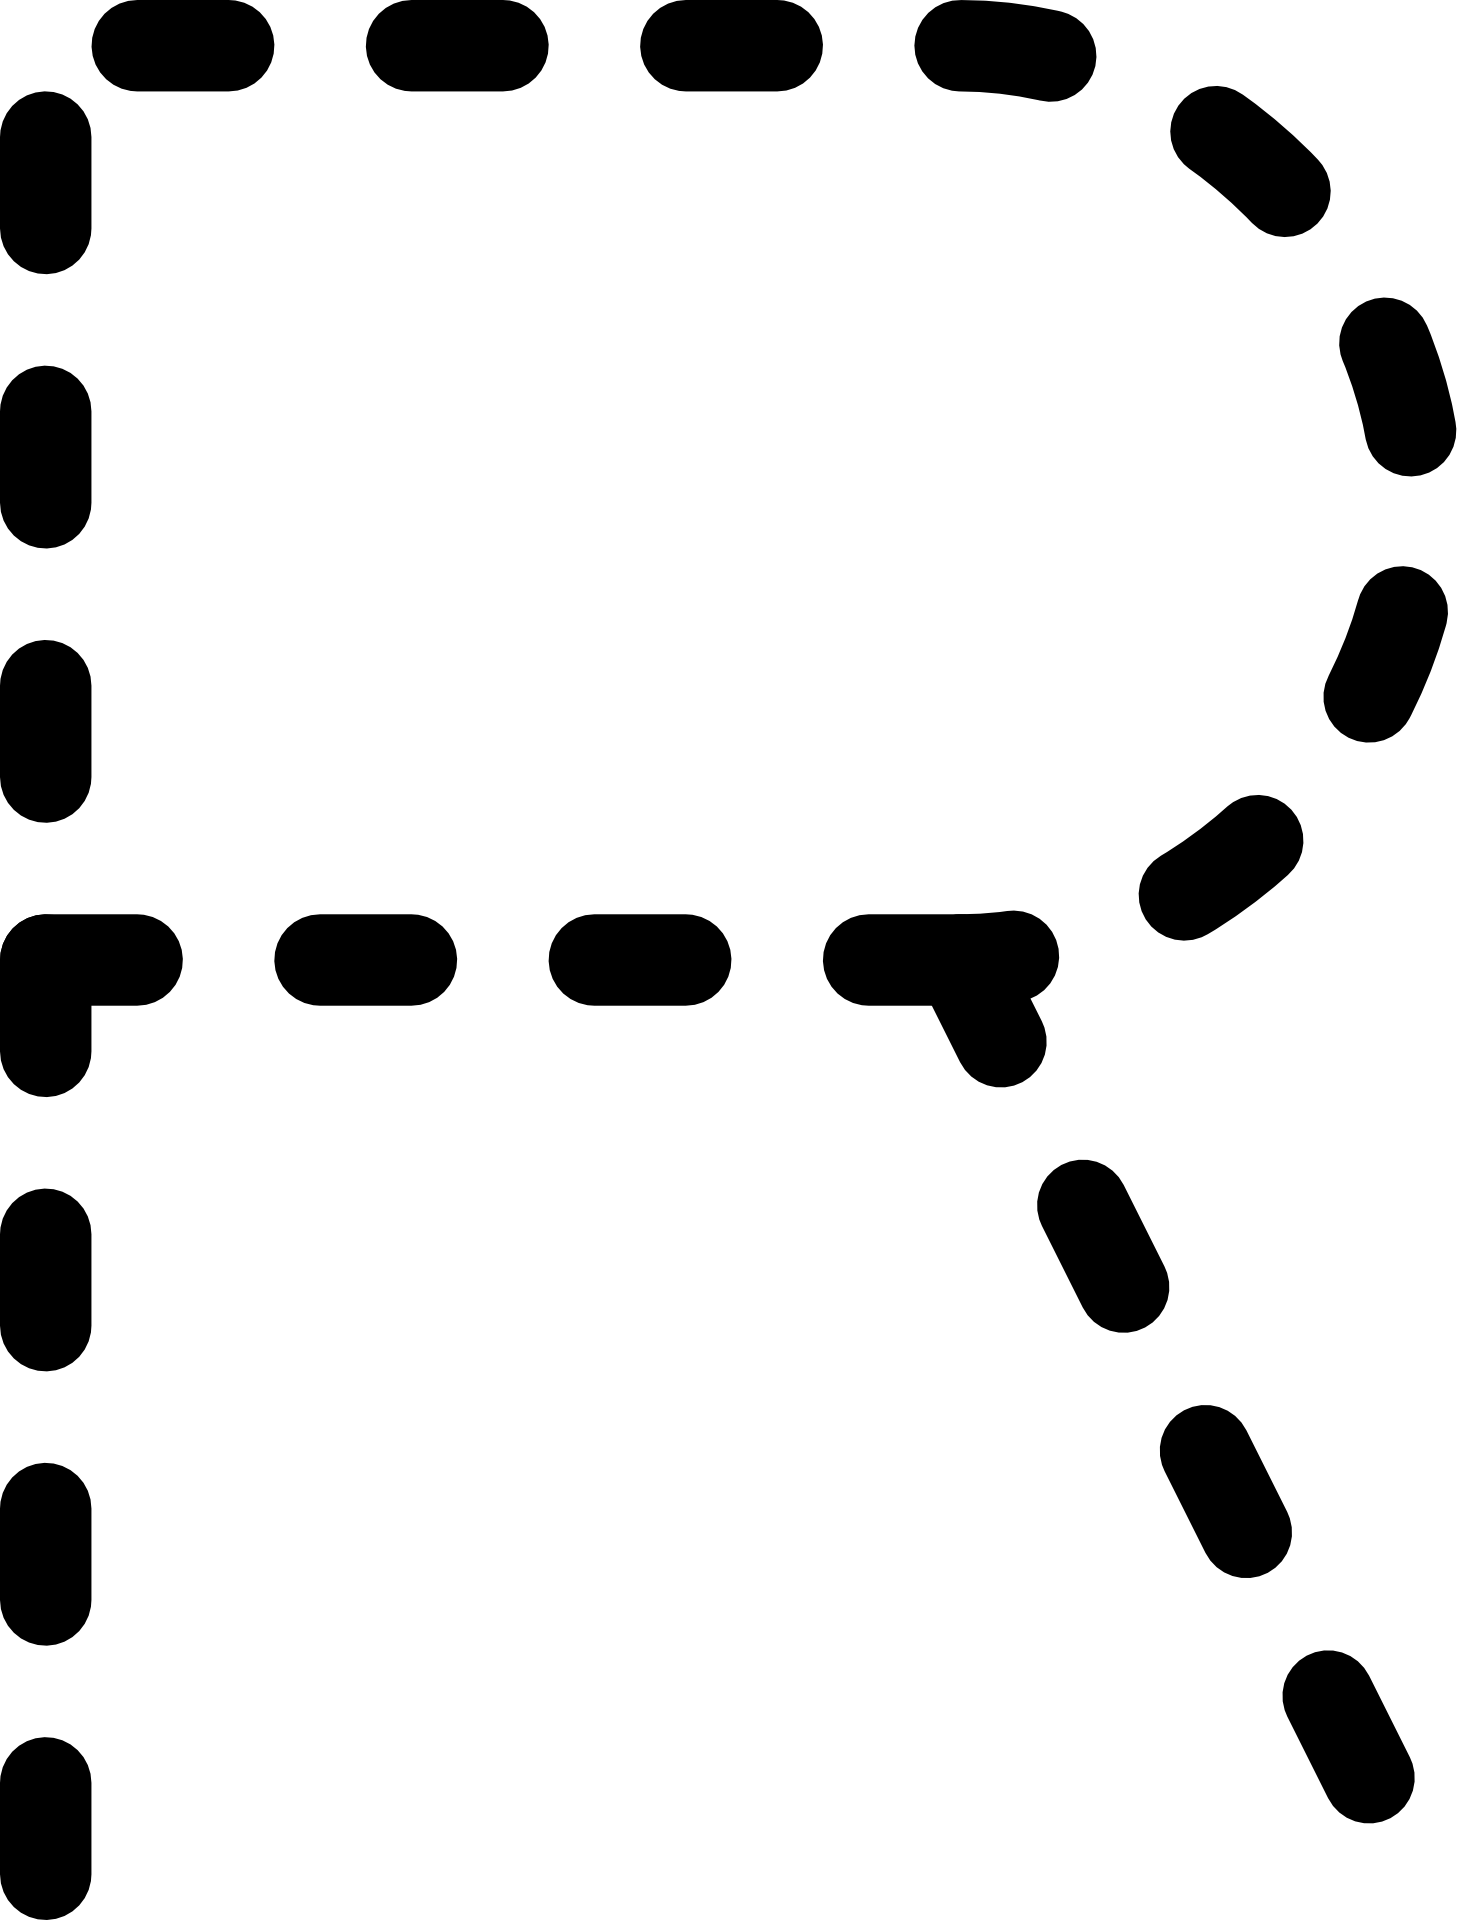 Dashed Line Of Alphabet Letter R Free Image